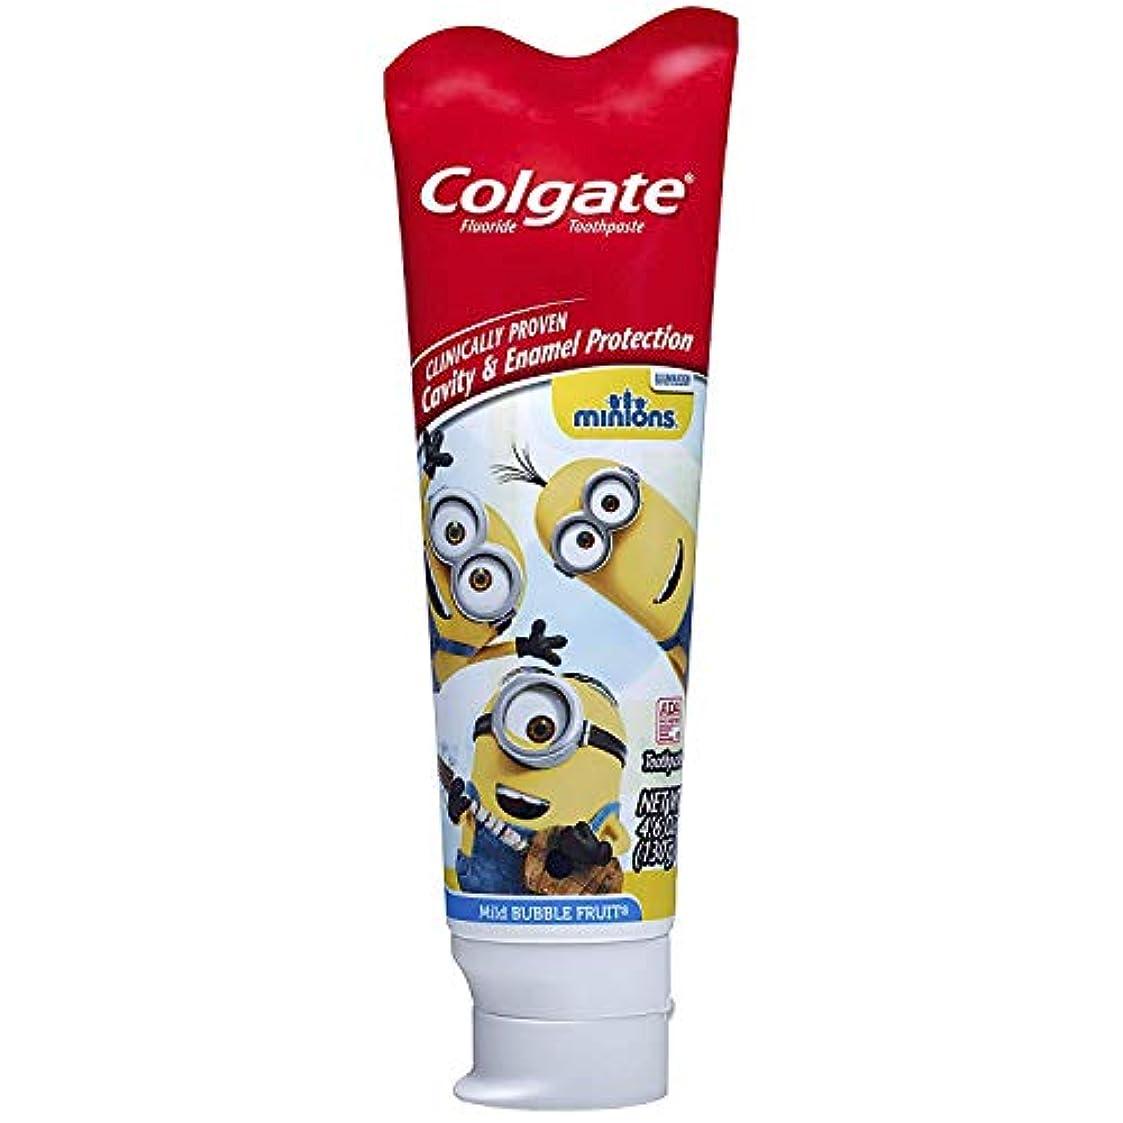 Colgate キッズ手下の歯磨き粉、マイルドバブルフルーツ4.60オズ(7パック) 7のパック